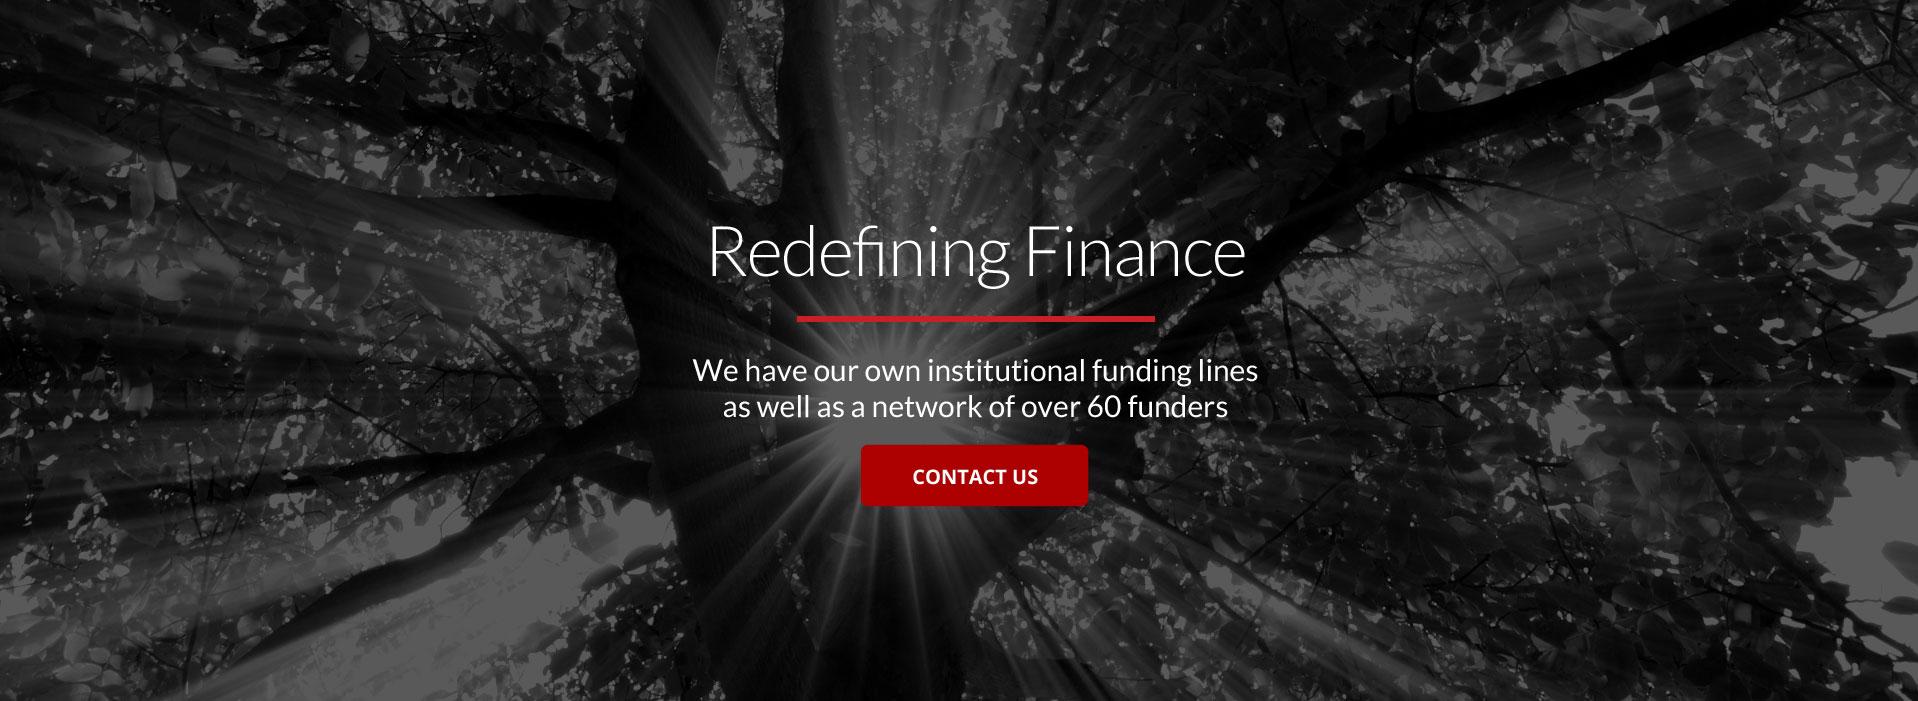 06-redefining-finance